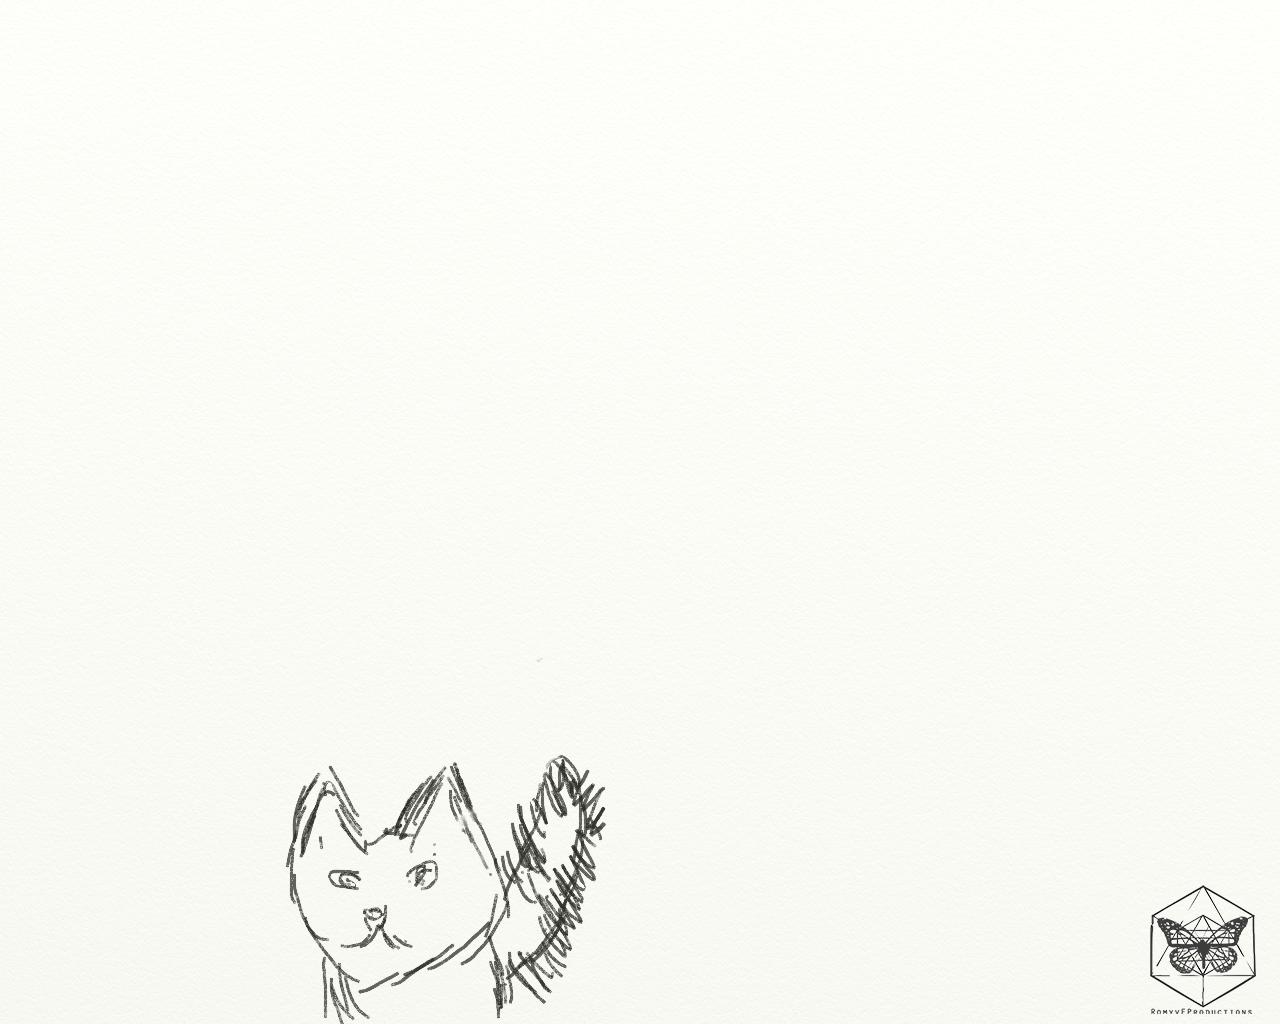 Kat schets